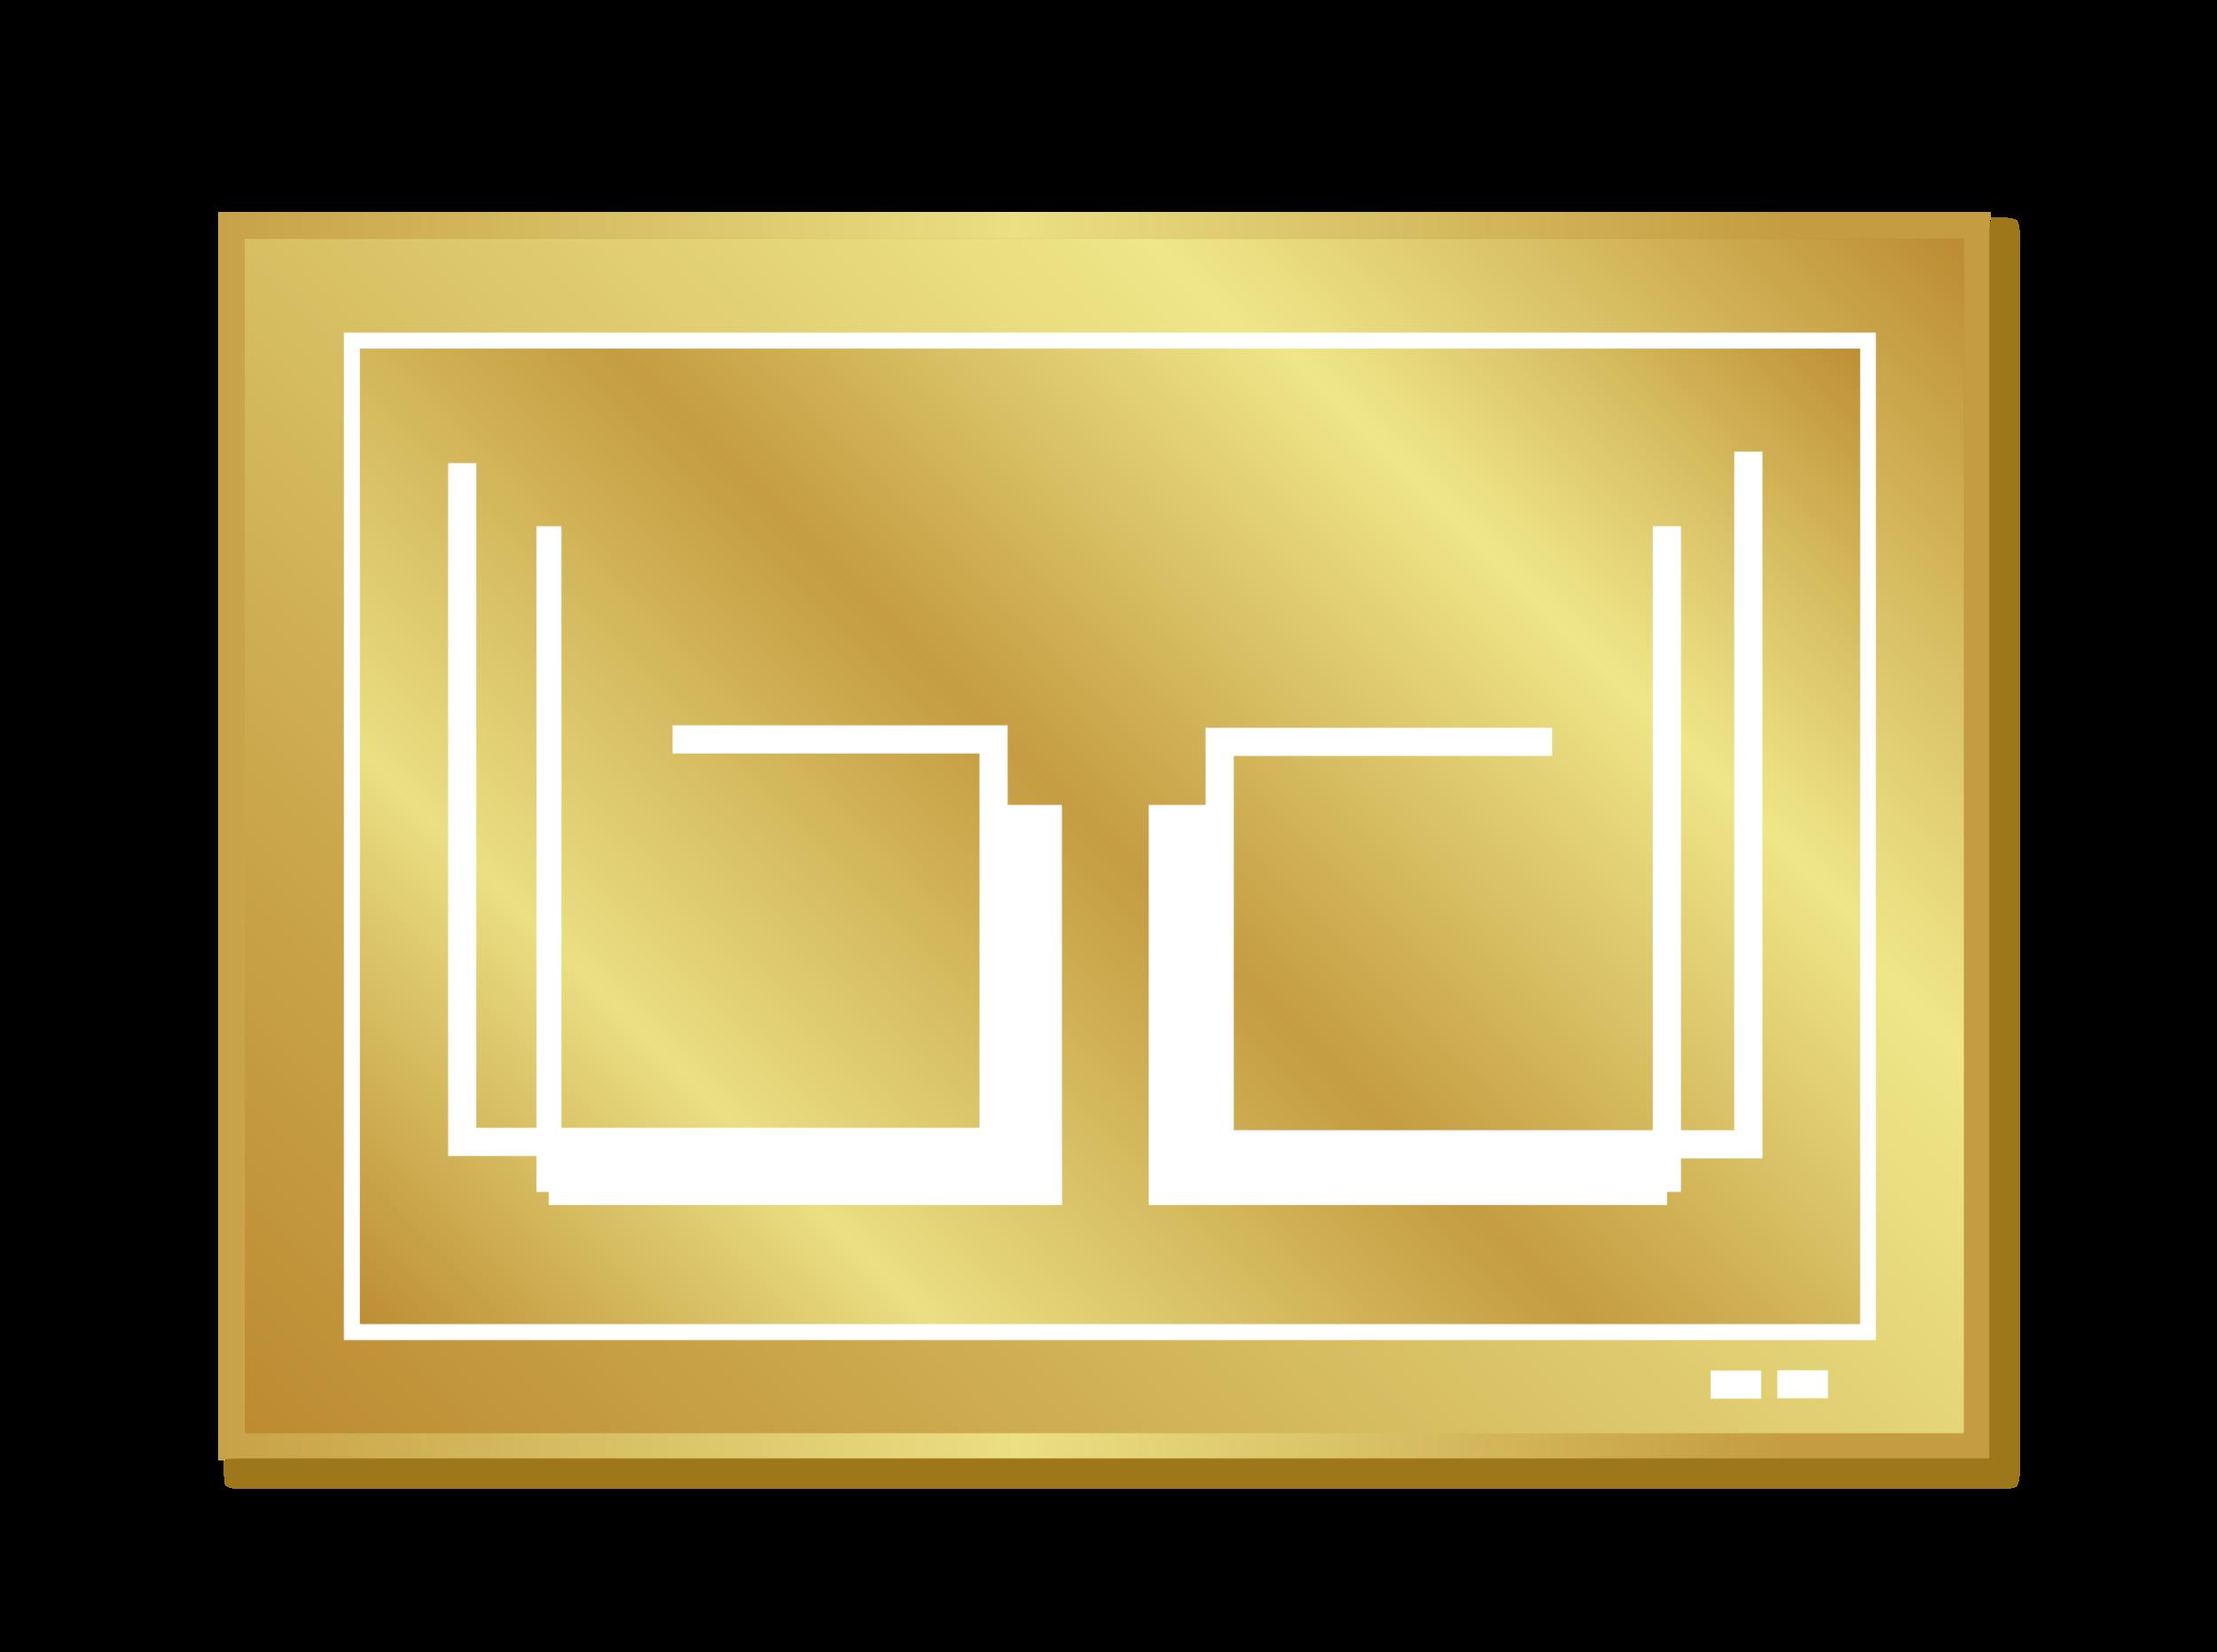 BLEEJ_HI-RES_GOLD_WHITE_ICON.png